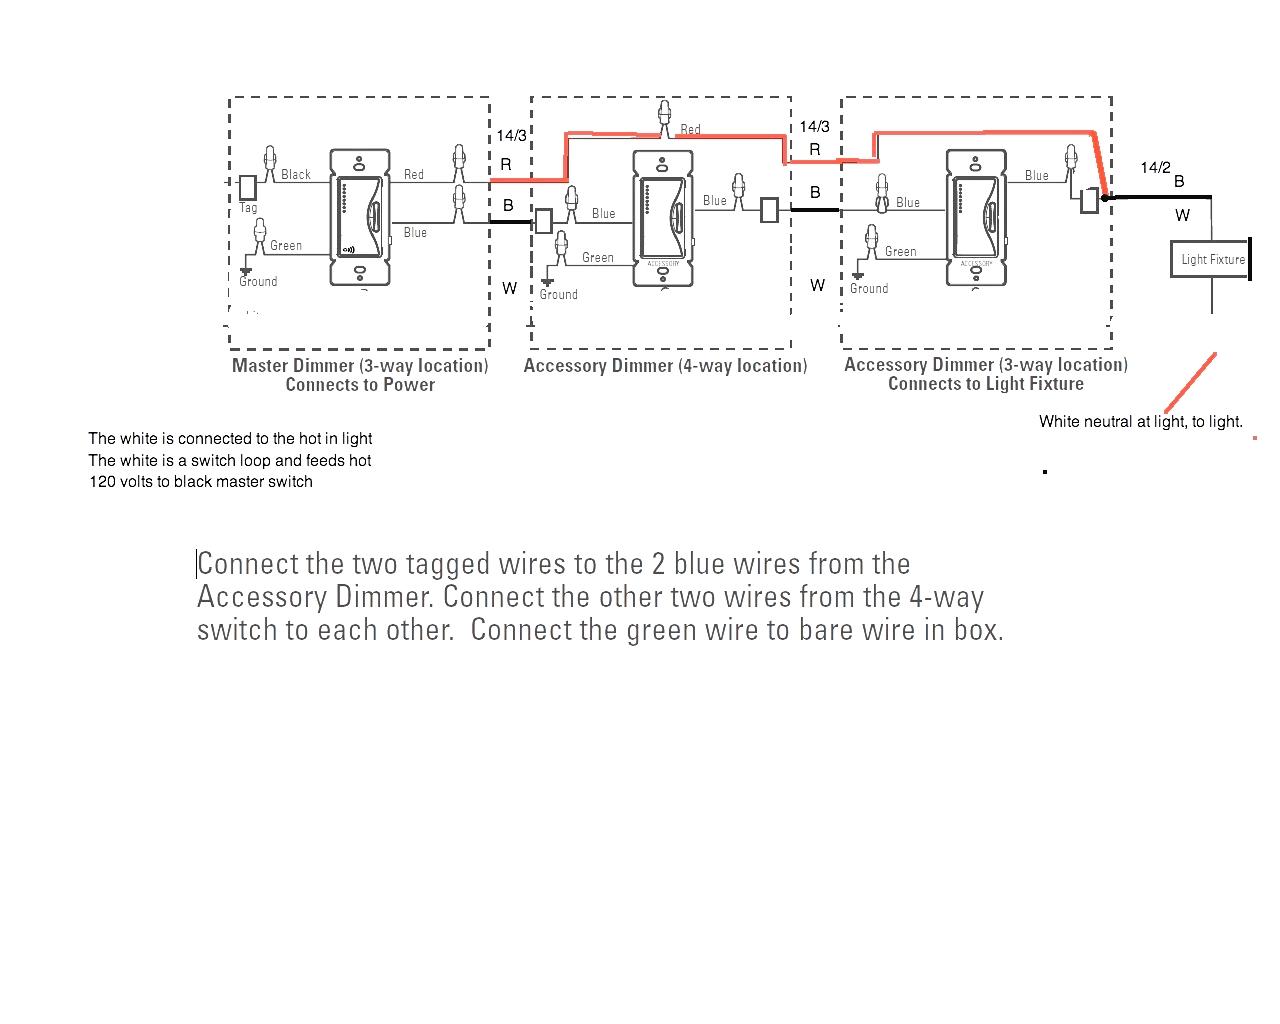 hight resolution of lutron 4 way switch diagram wiring diagram insideleviton dimmer wiring diagram wiring diagram leviton 4 way